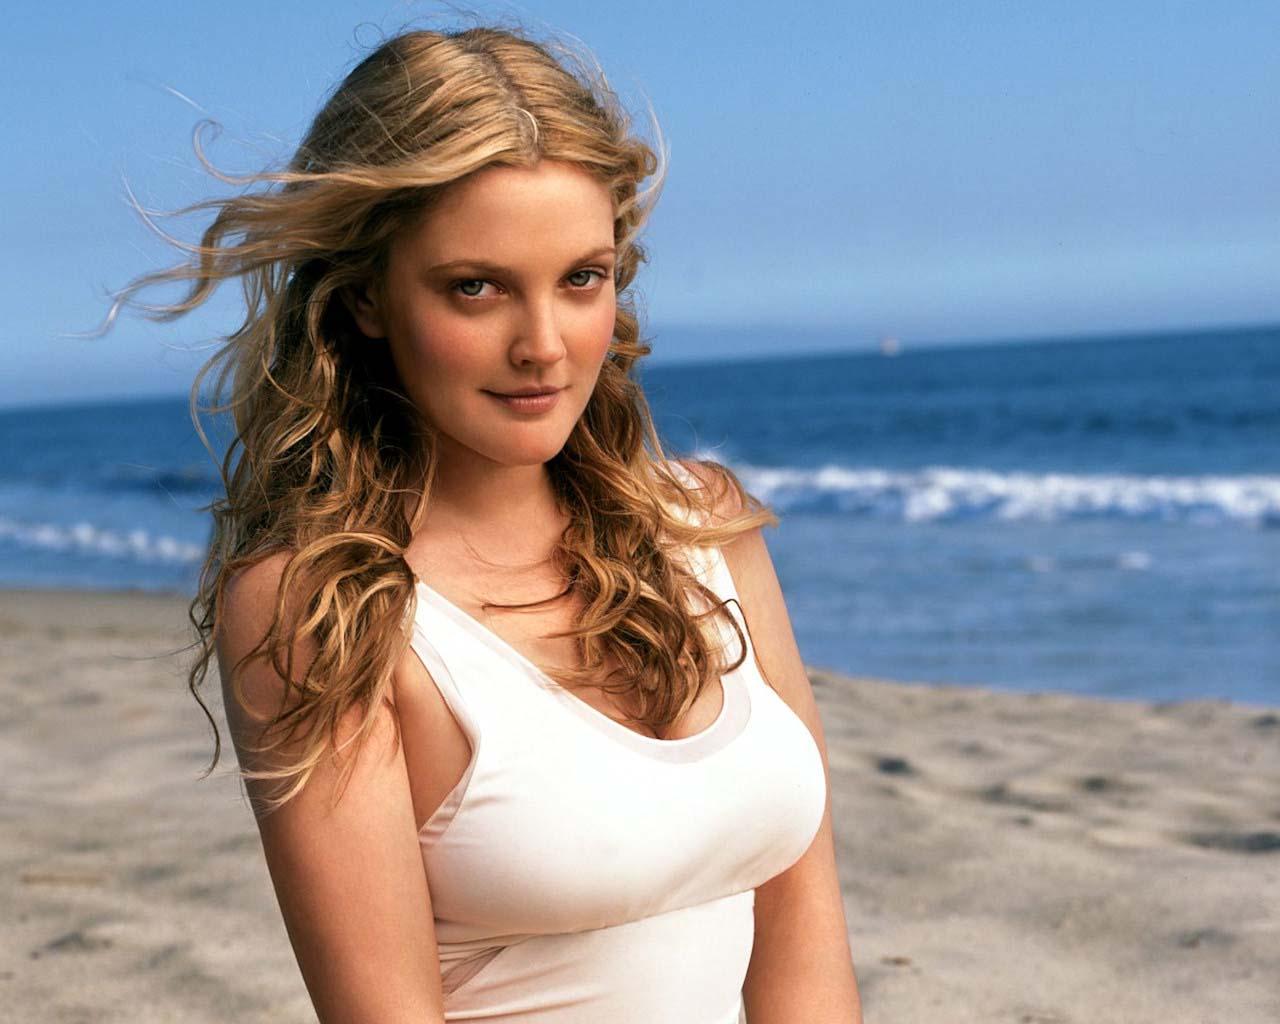 http://1.bp.blogspot.com/-Dj2r-0JXOq8/TqeZ5-pUcQI/AAAAAAAADl8/EXU-3k-ixTw/s1600/Drew-Barrymore-Hot-Hollywood-Actress-Wallpapers-8.jpg